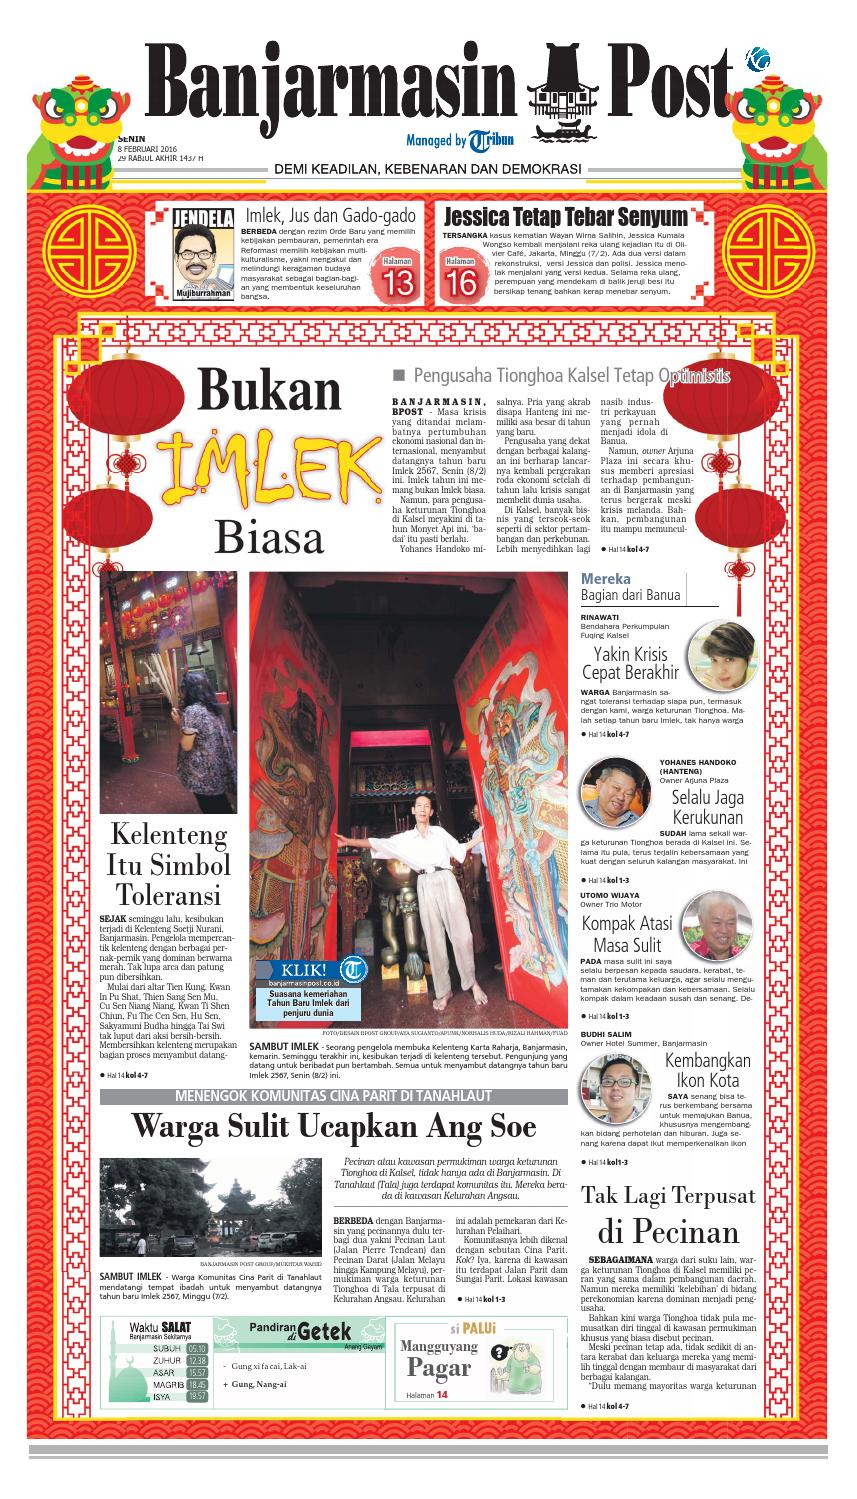 Banjarmasin Post Senin 8 Februari 2016 By Issuu Produk Ukm Bumn Jamu Kunyit Asam Seger Waras